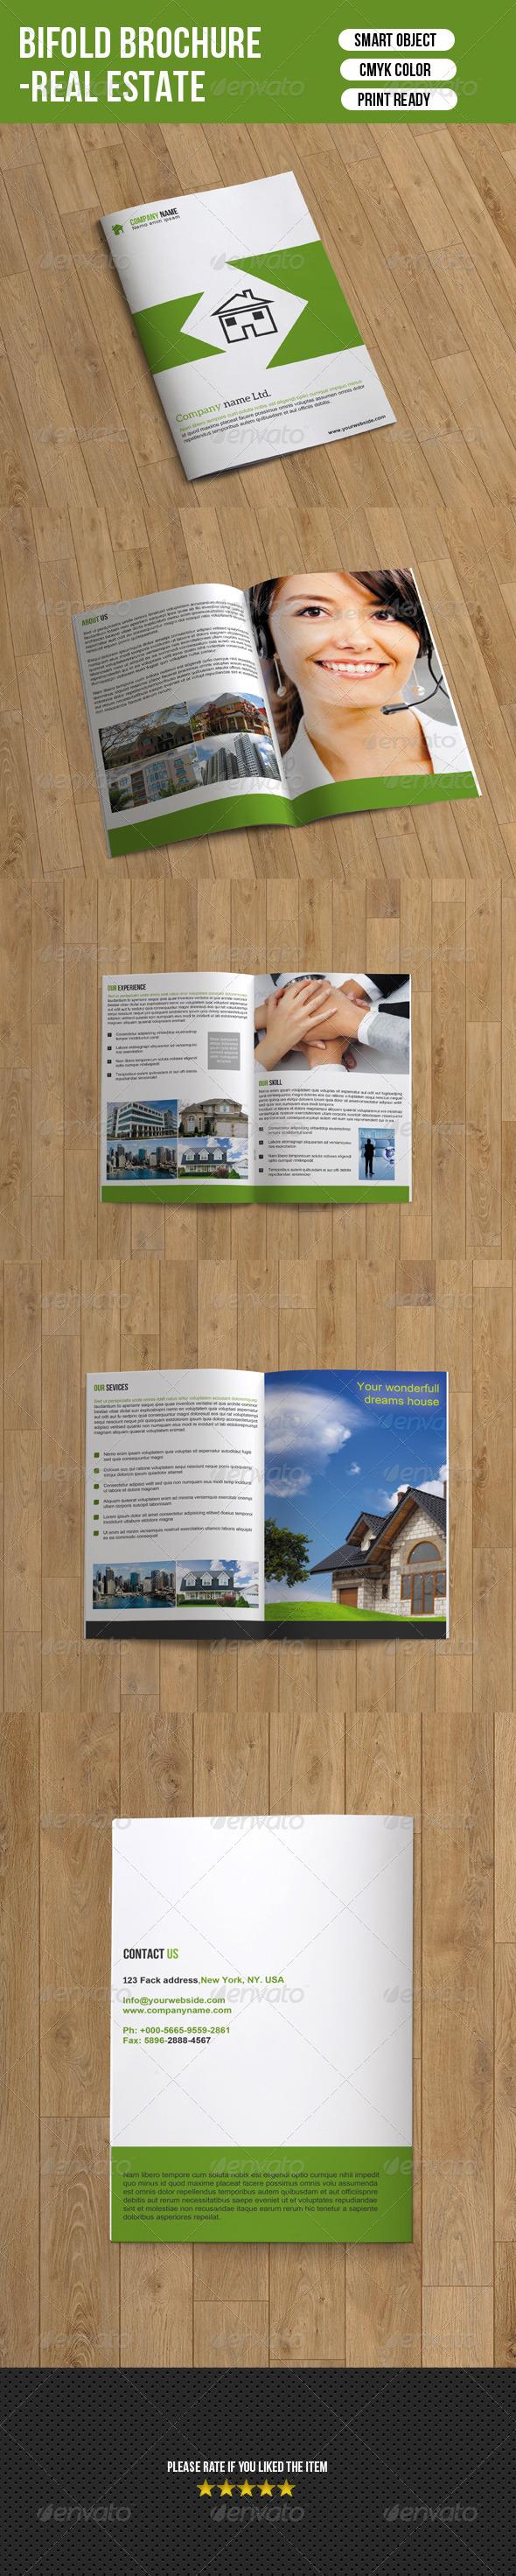 Bifold Real Estate Brochure